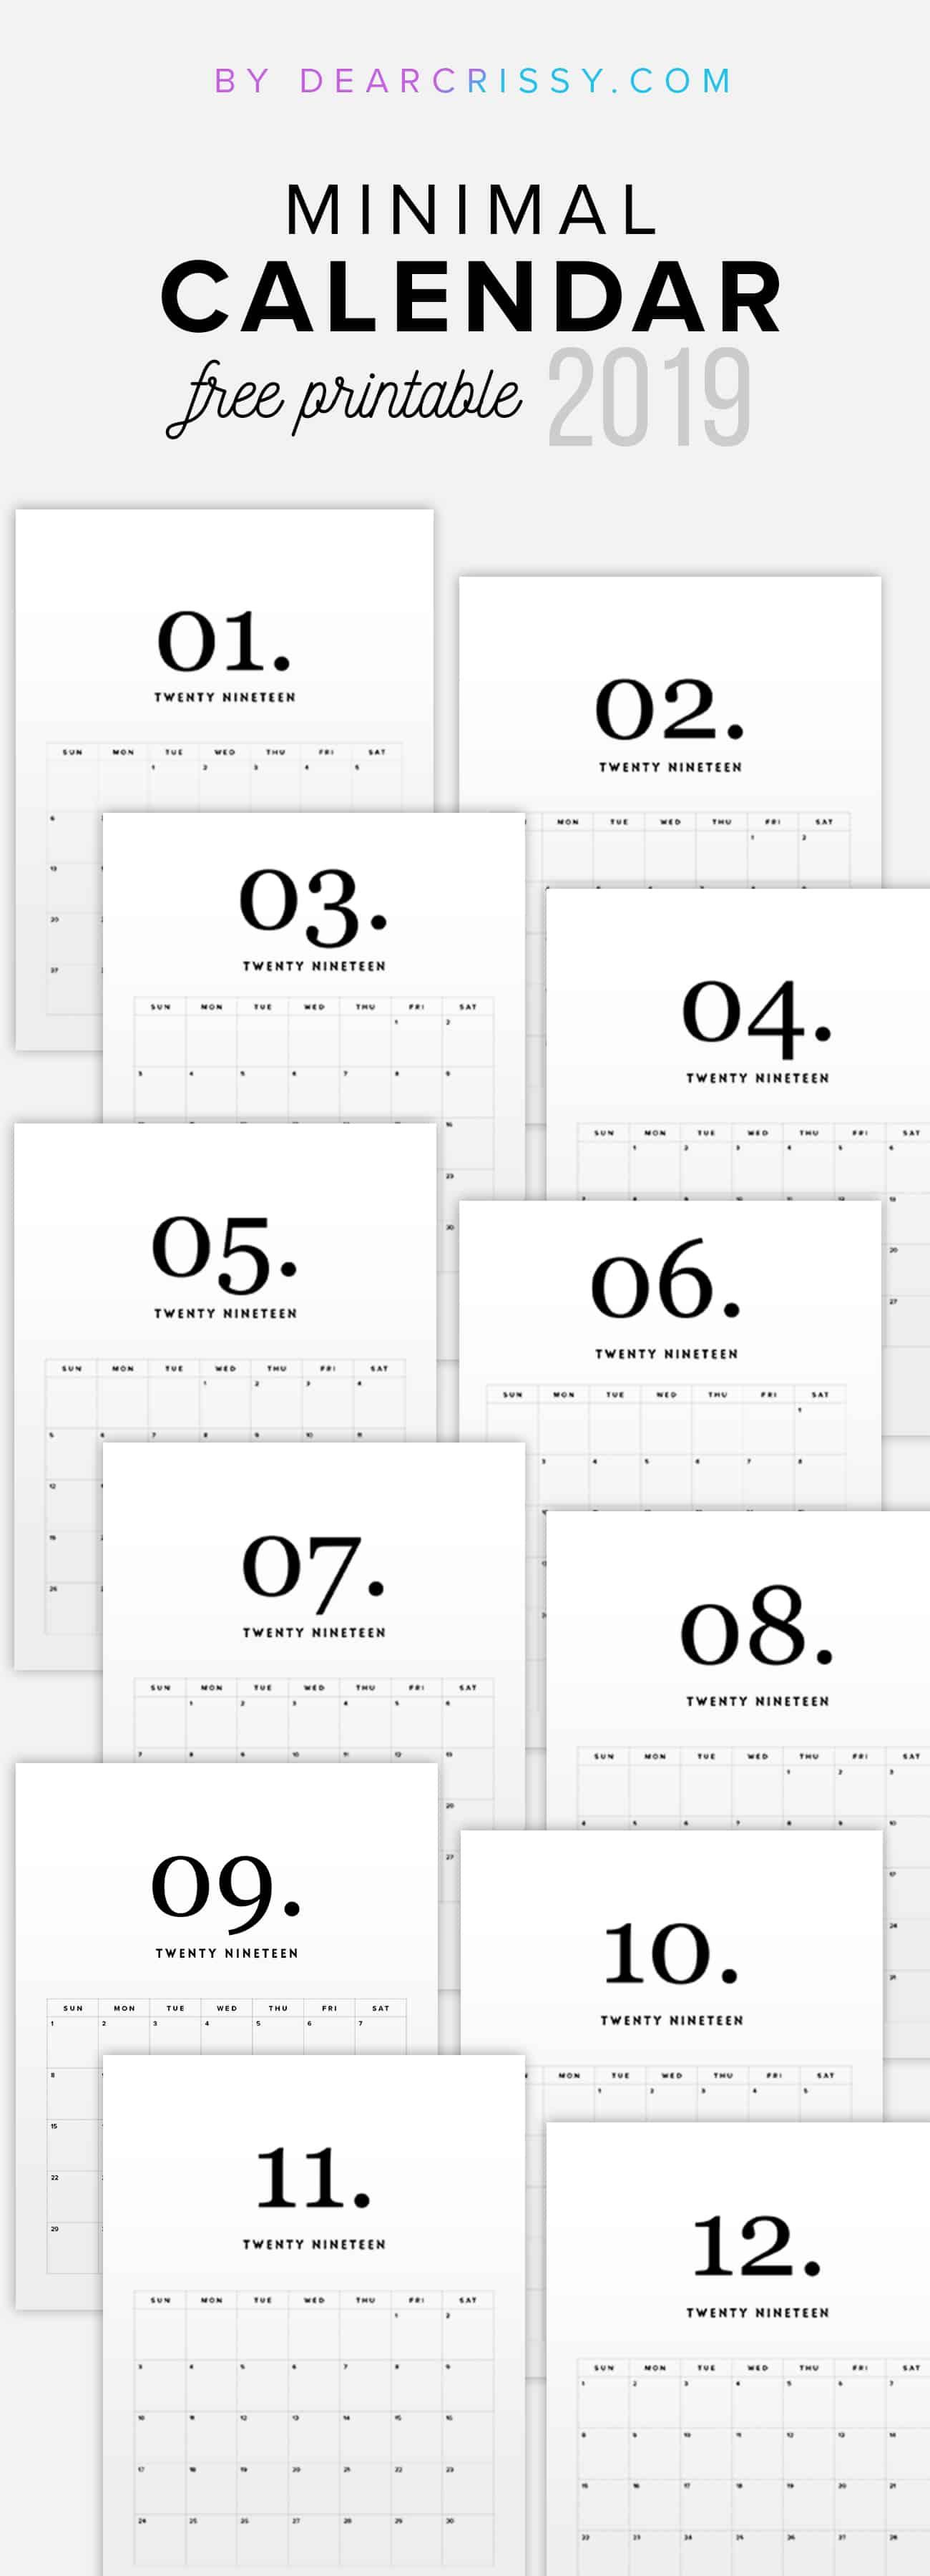 19 Free Printable Calendars To Kick Start The New Year